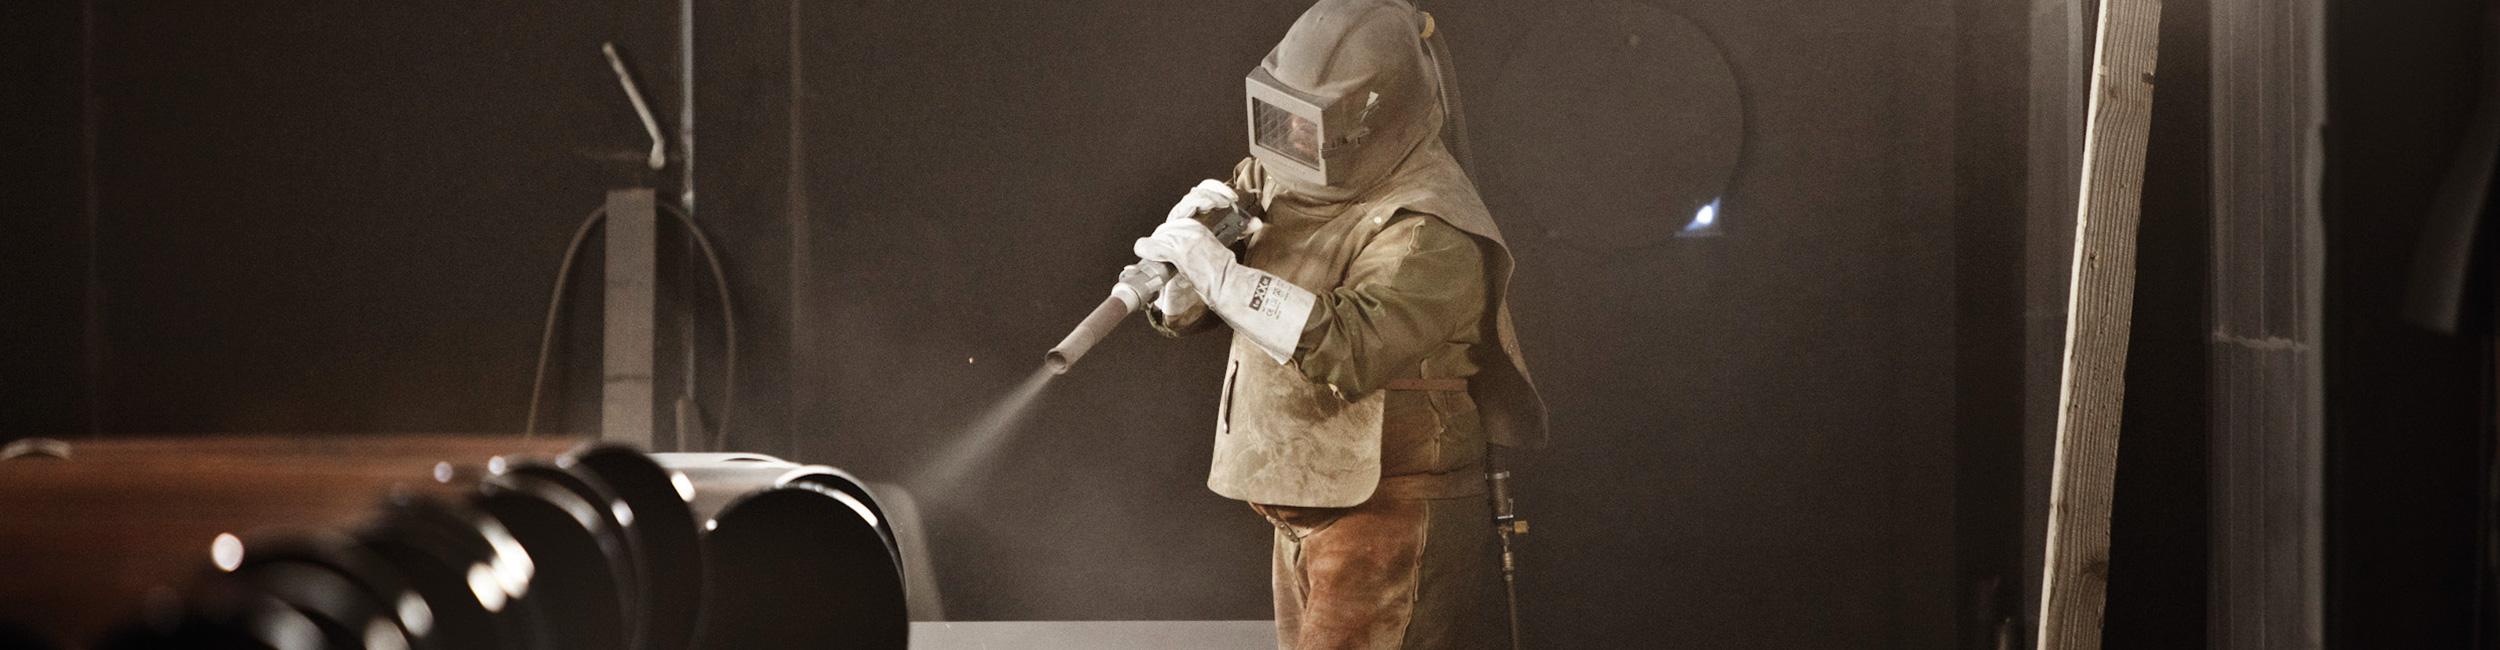 korrosionsschutz